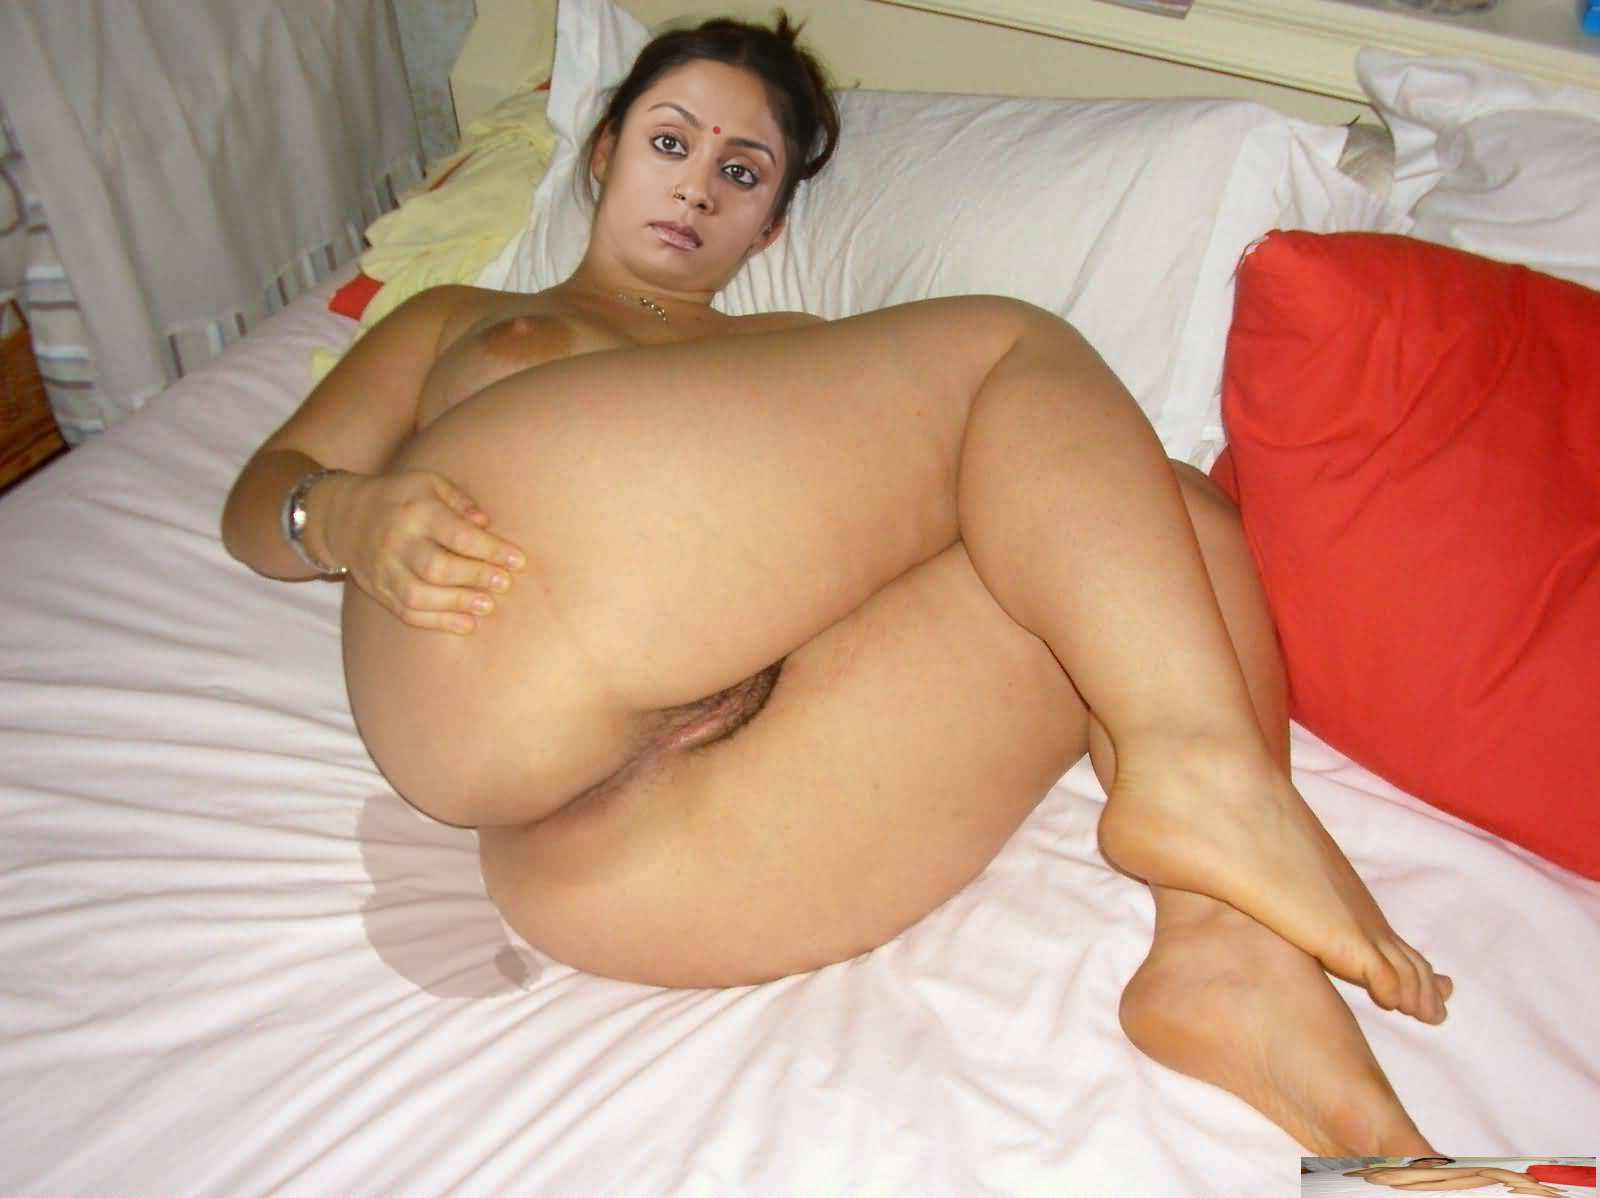 Italian Teen Sex Picture 42